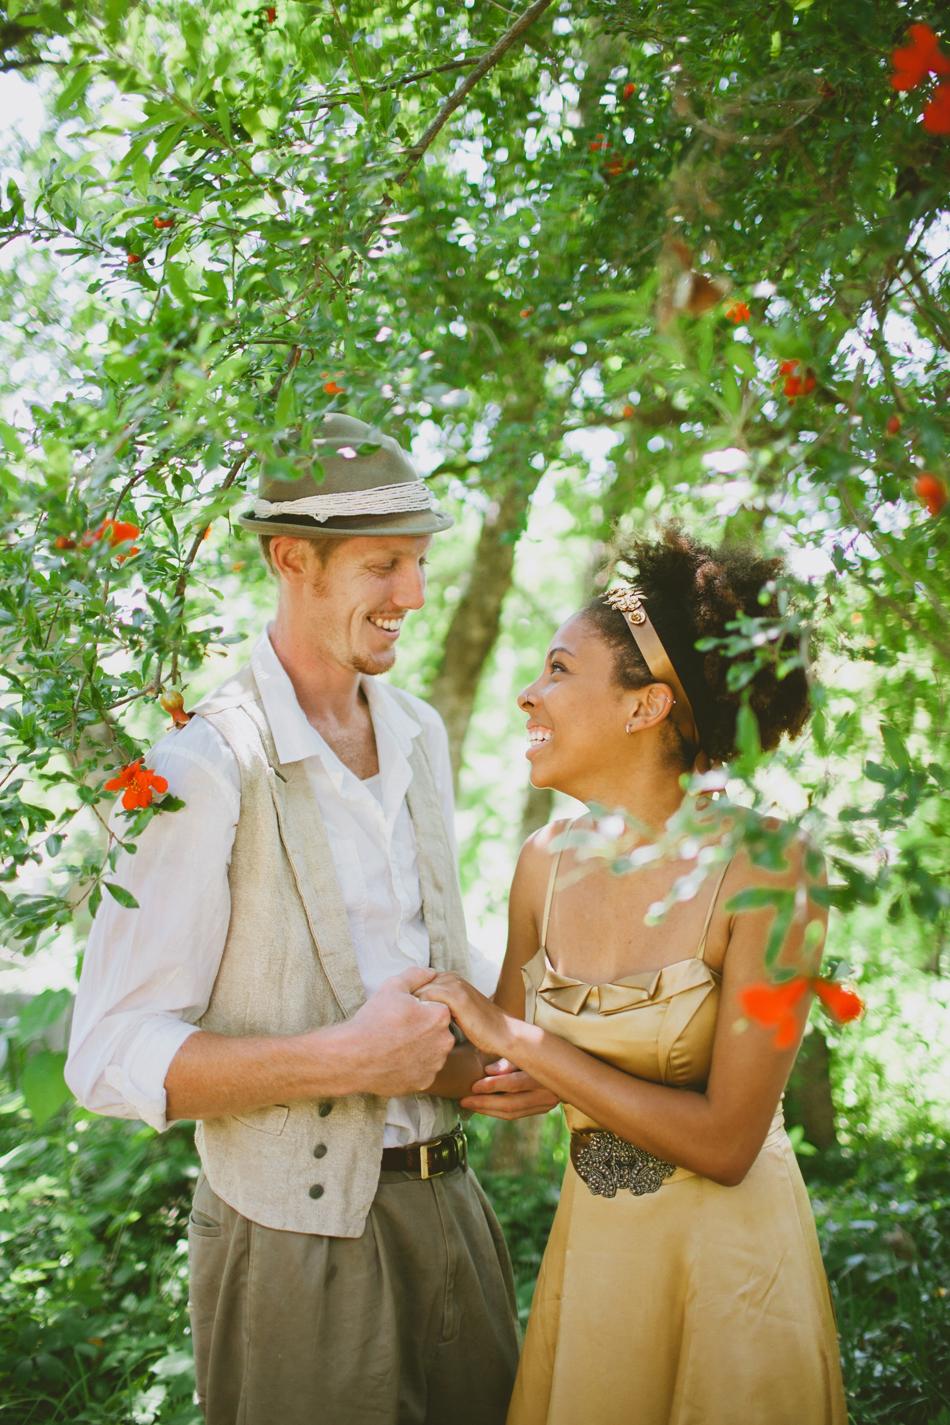 Jameykay_arlie_bohemian_elopement_styled_shoot001.jpg